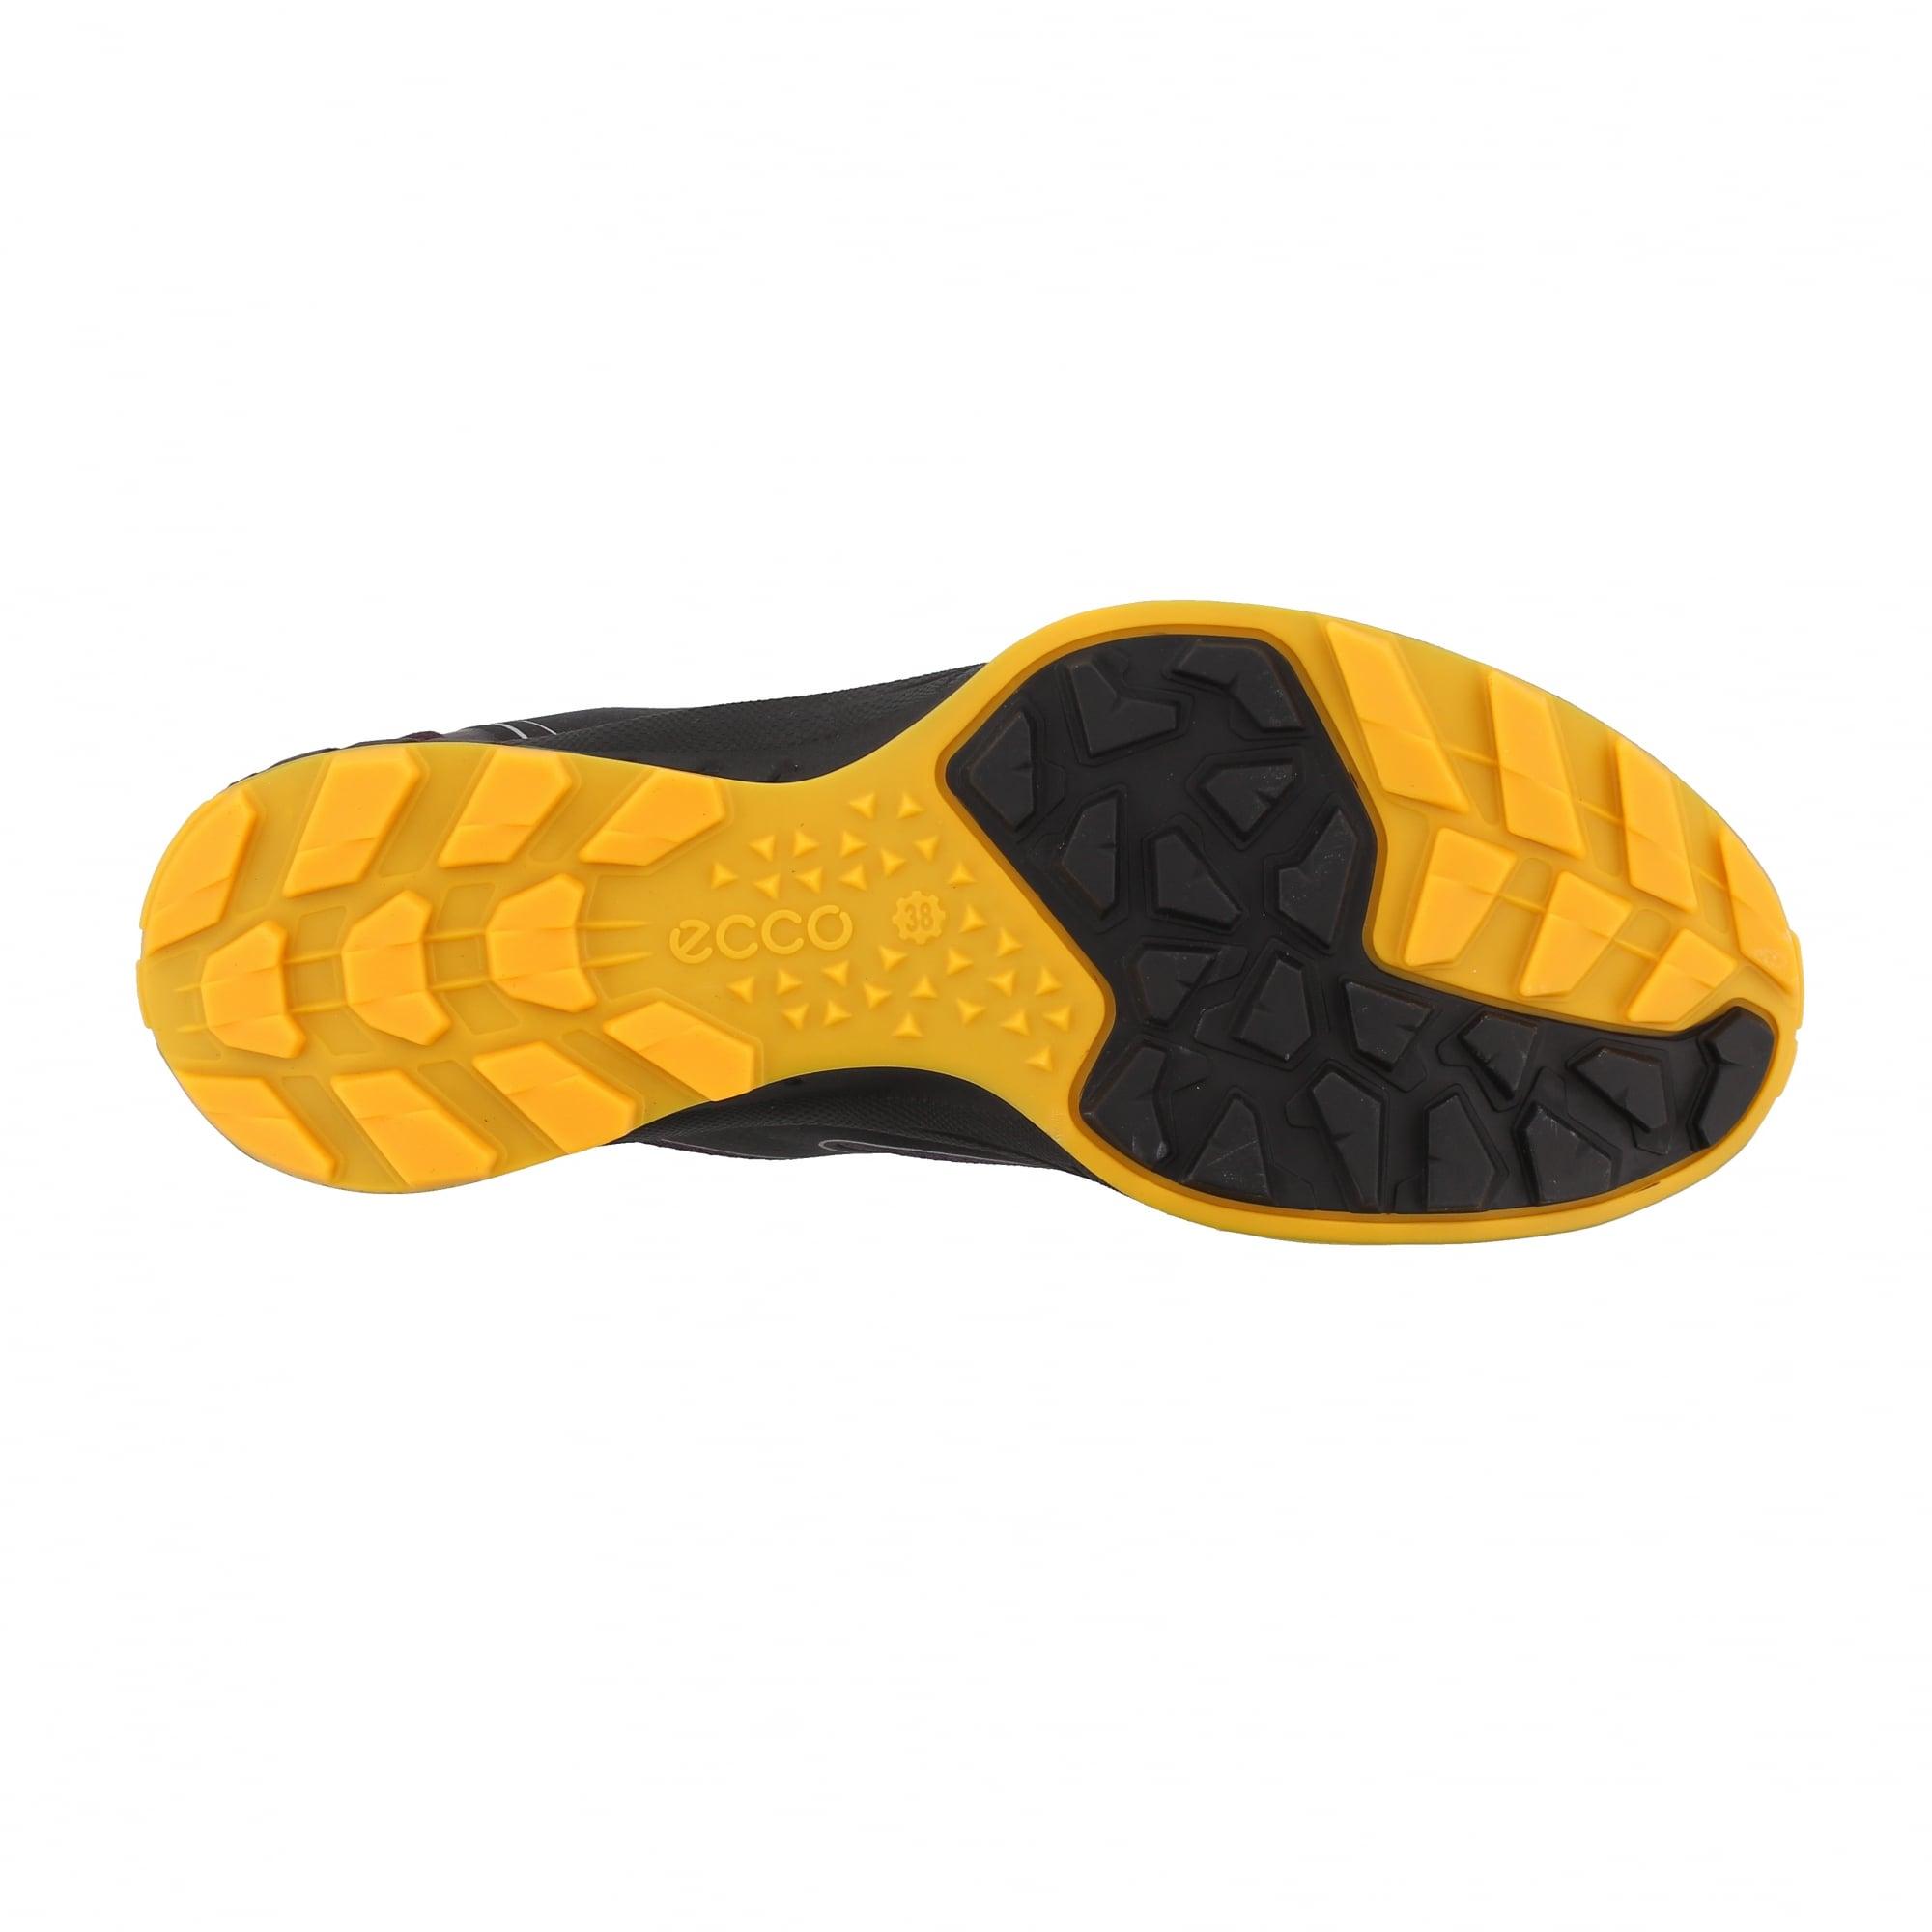 1551e2e817 Ecco Biom Trail | 800583-59679 - Womens from Rogerson Shoes UK